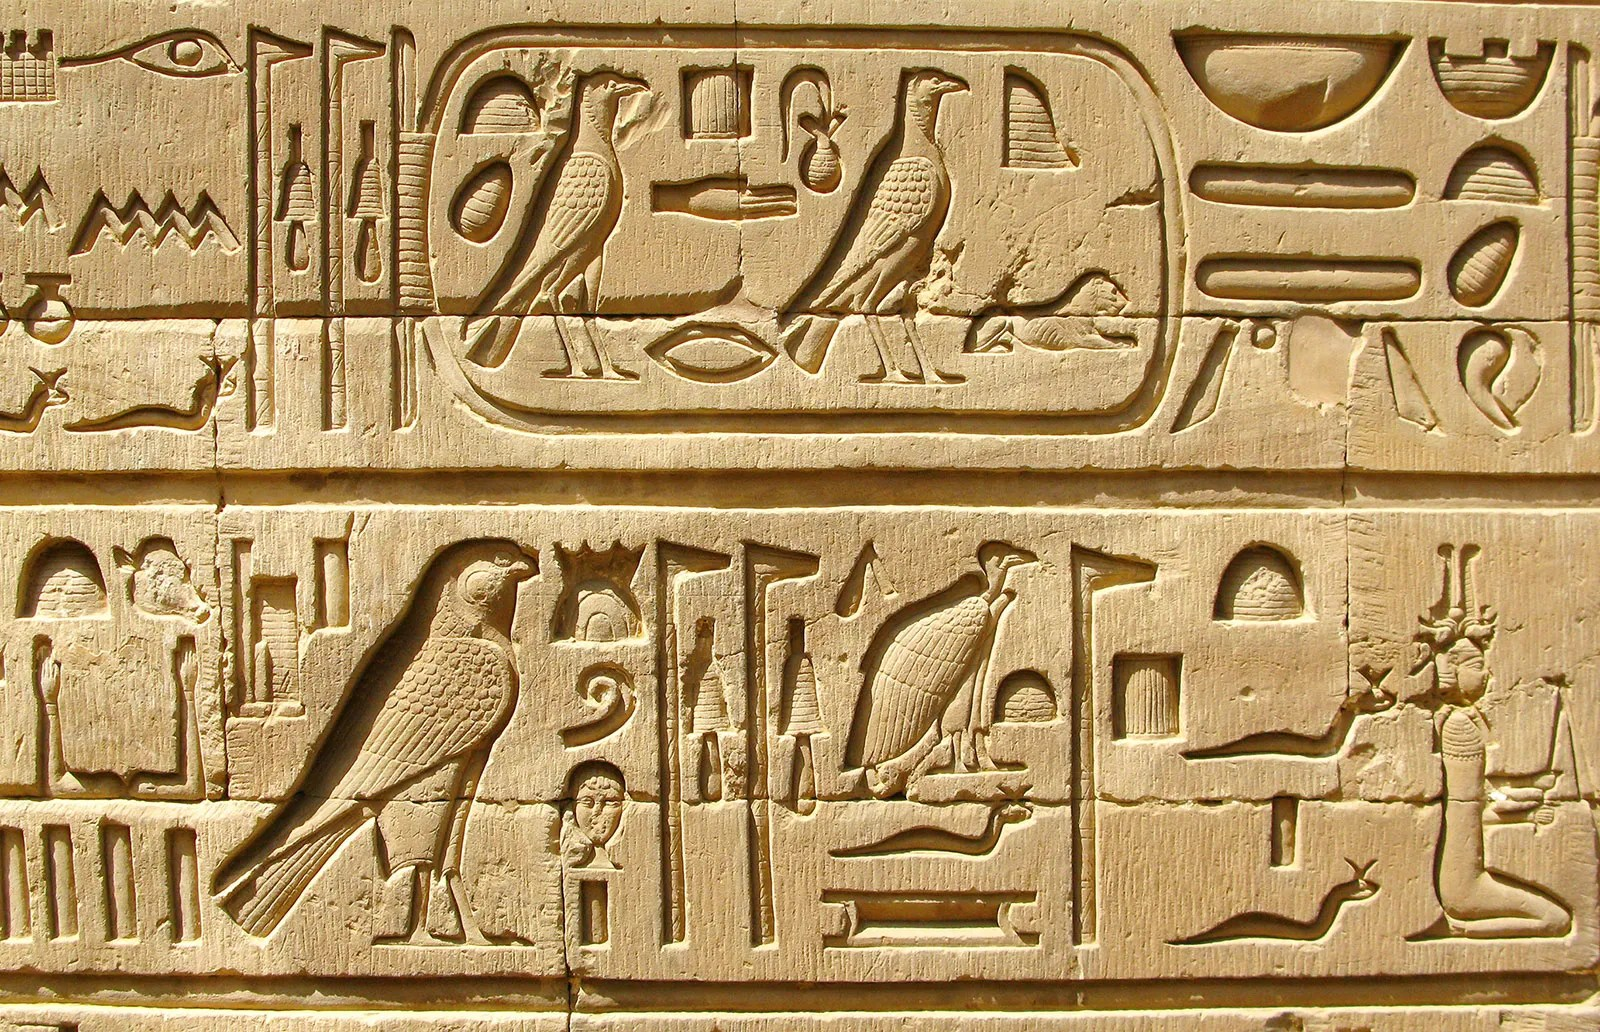 Hieroglyphic Writing